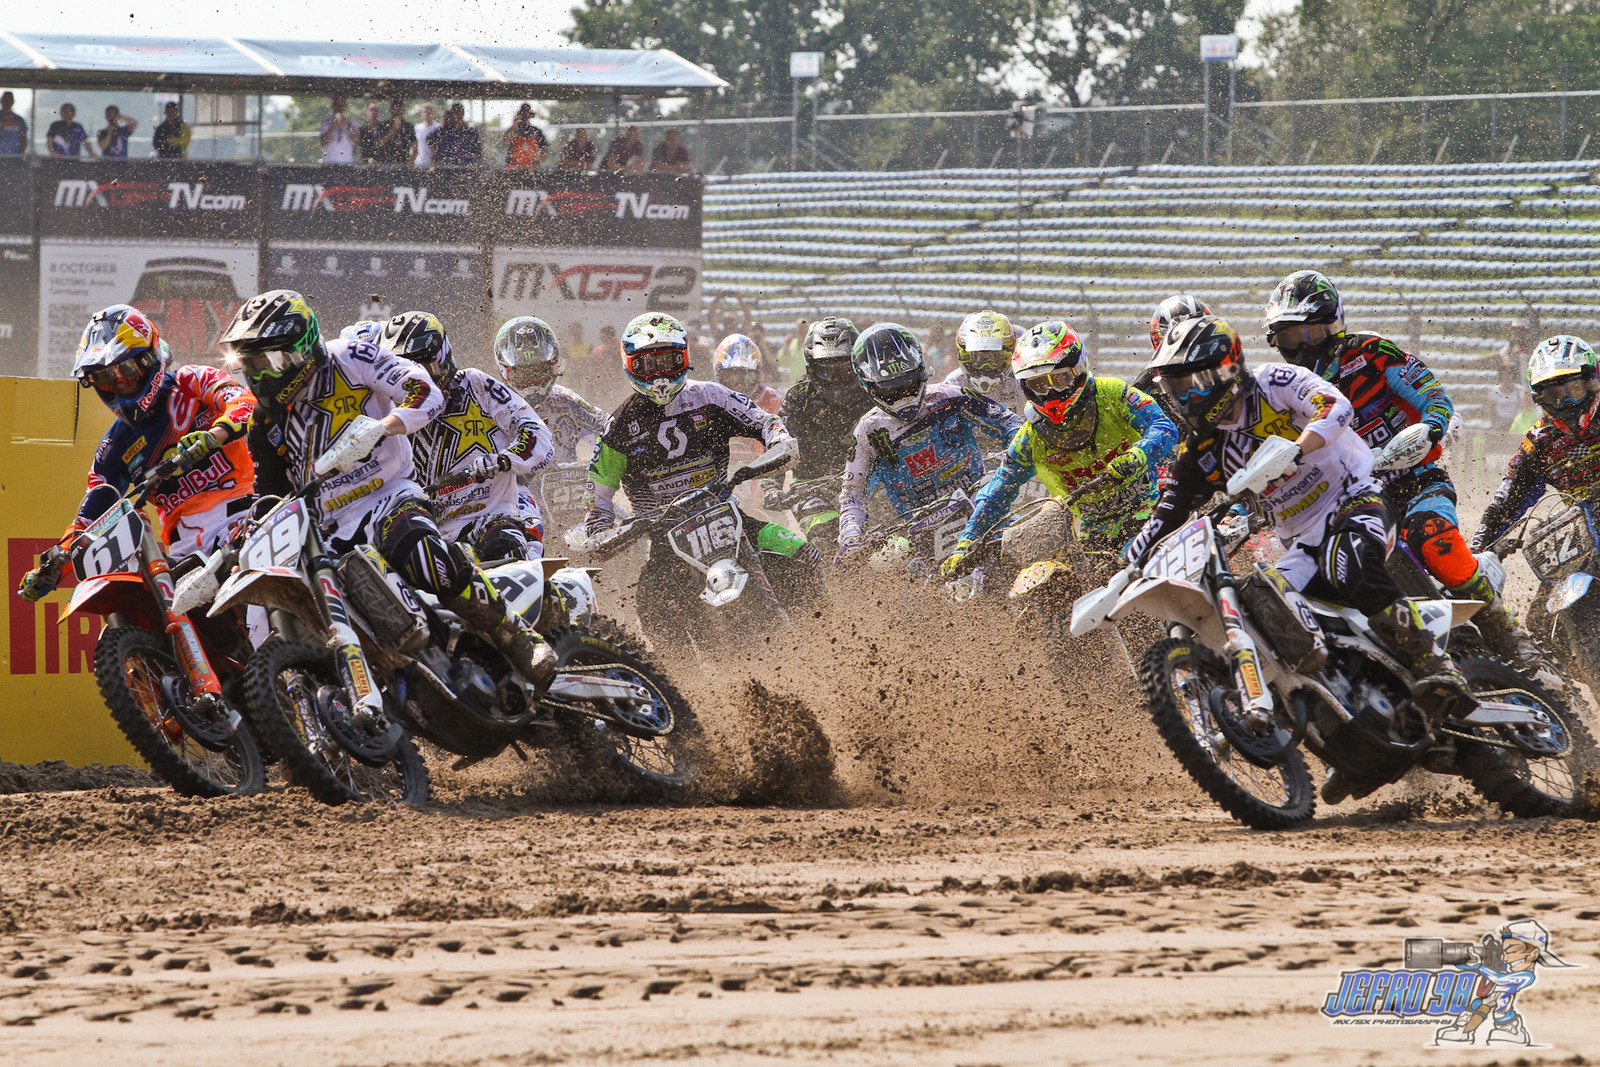 MX2 Moto1 Start - Photo Gallery: MXGP of the Netherlands - Motocross Pictures - Vital MX